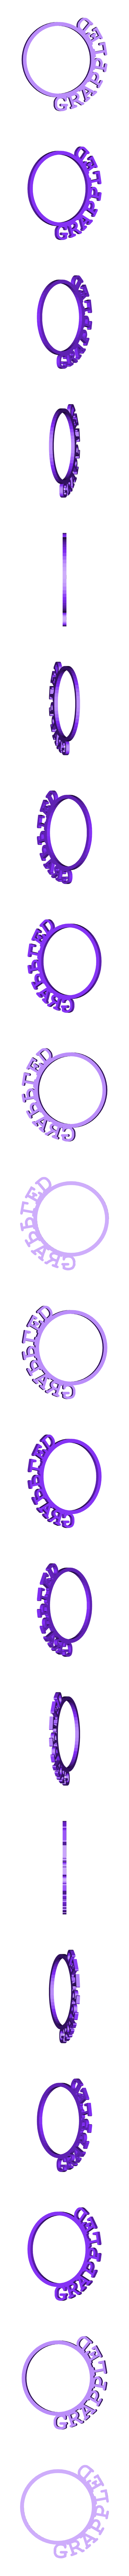 LRingGrappled.stl Download STL file D&D Condition Rings • 3D printable design, Jinja